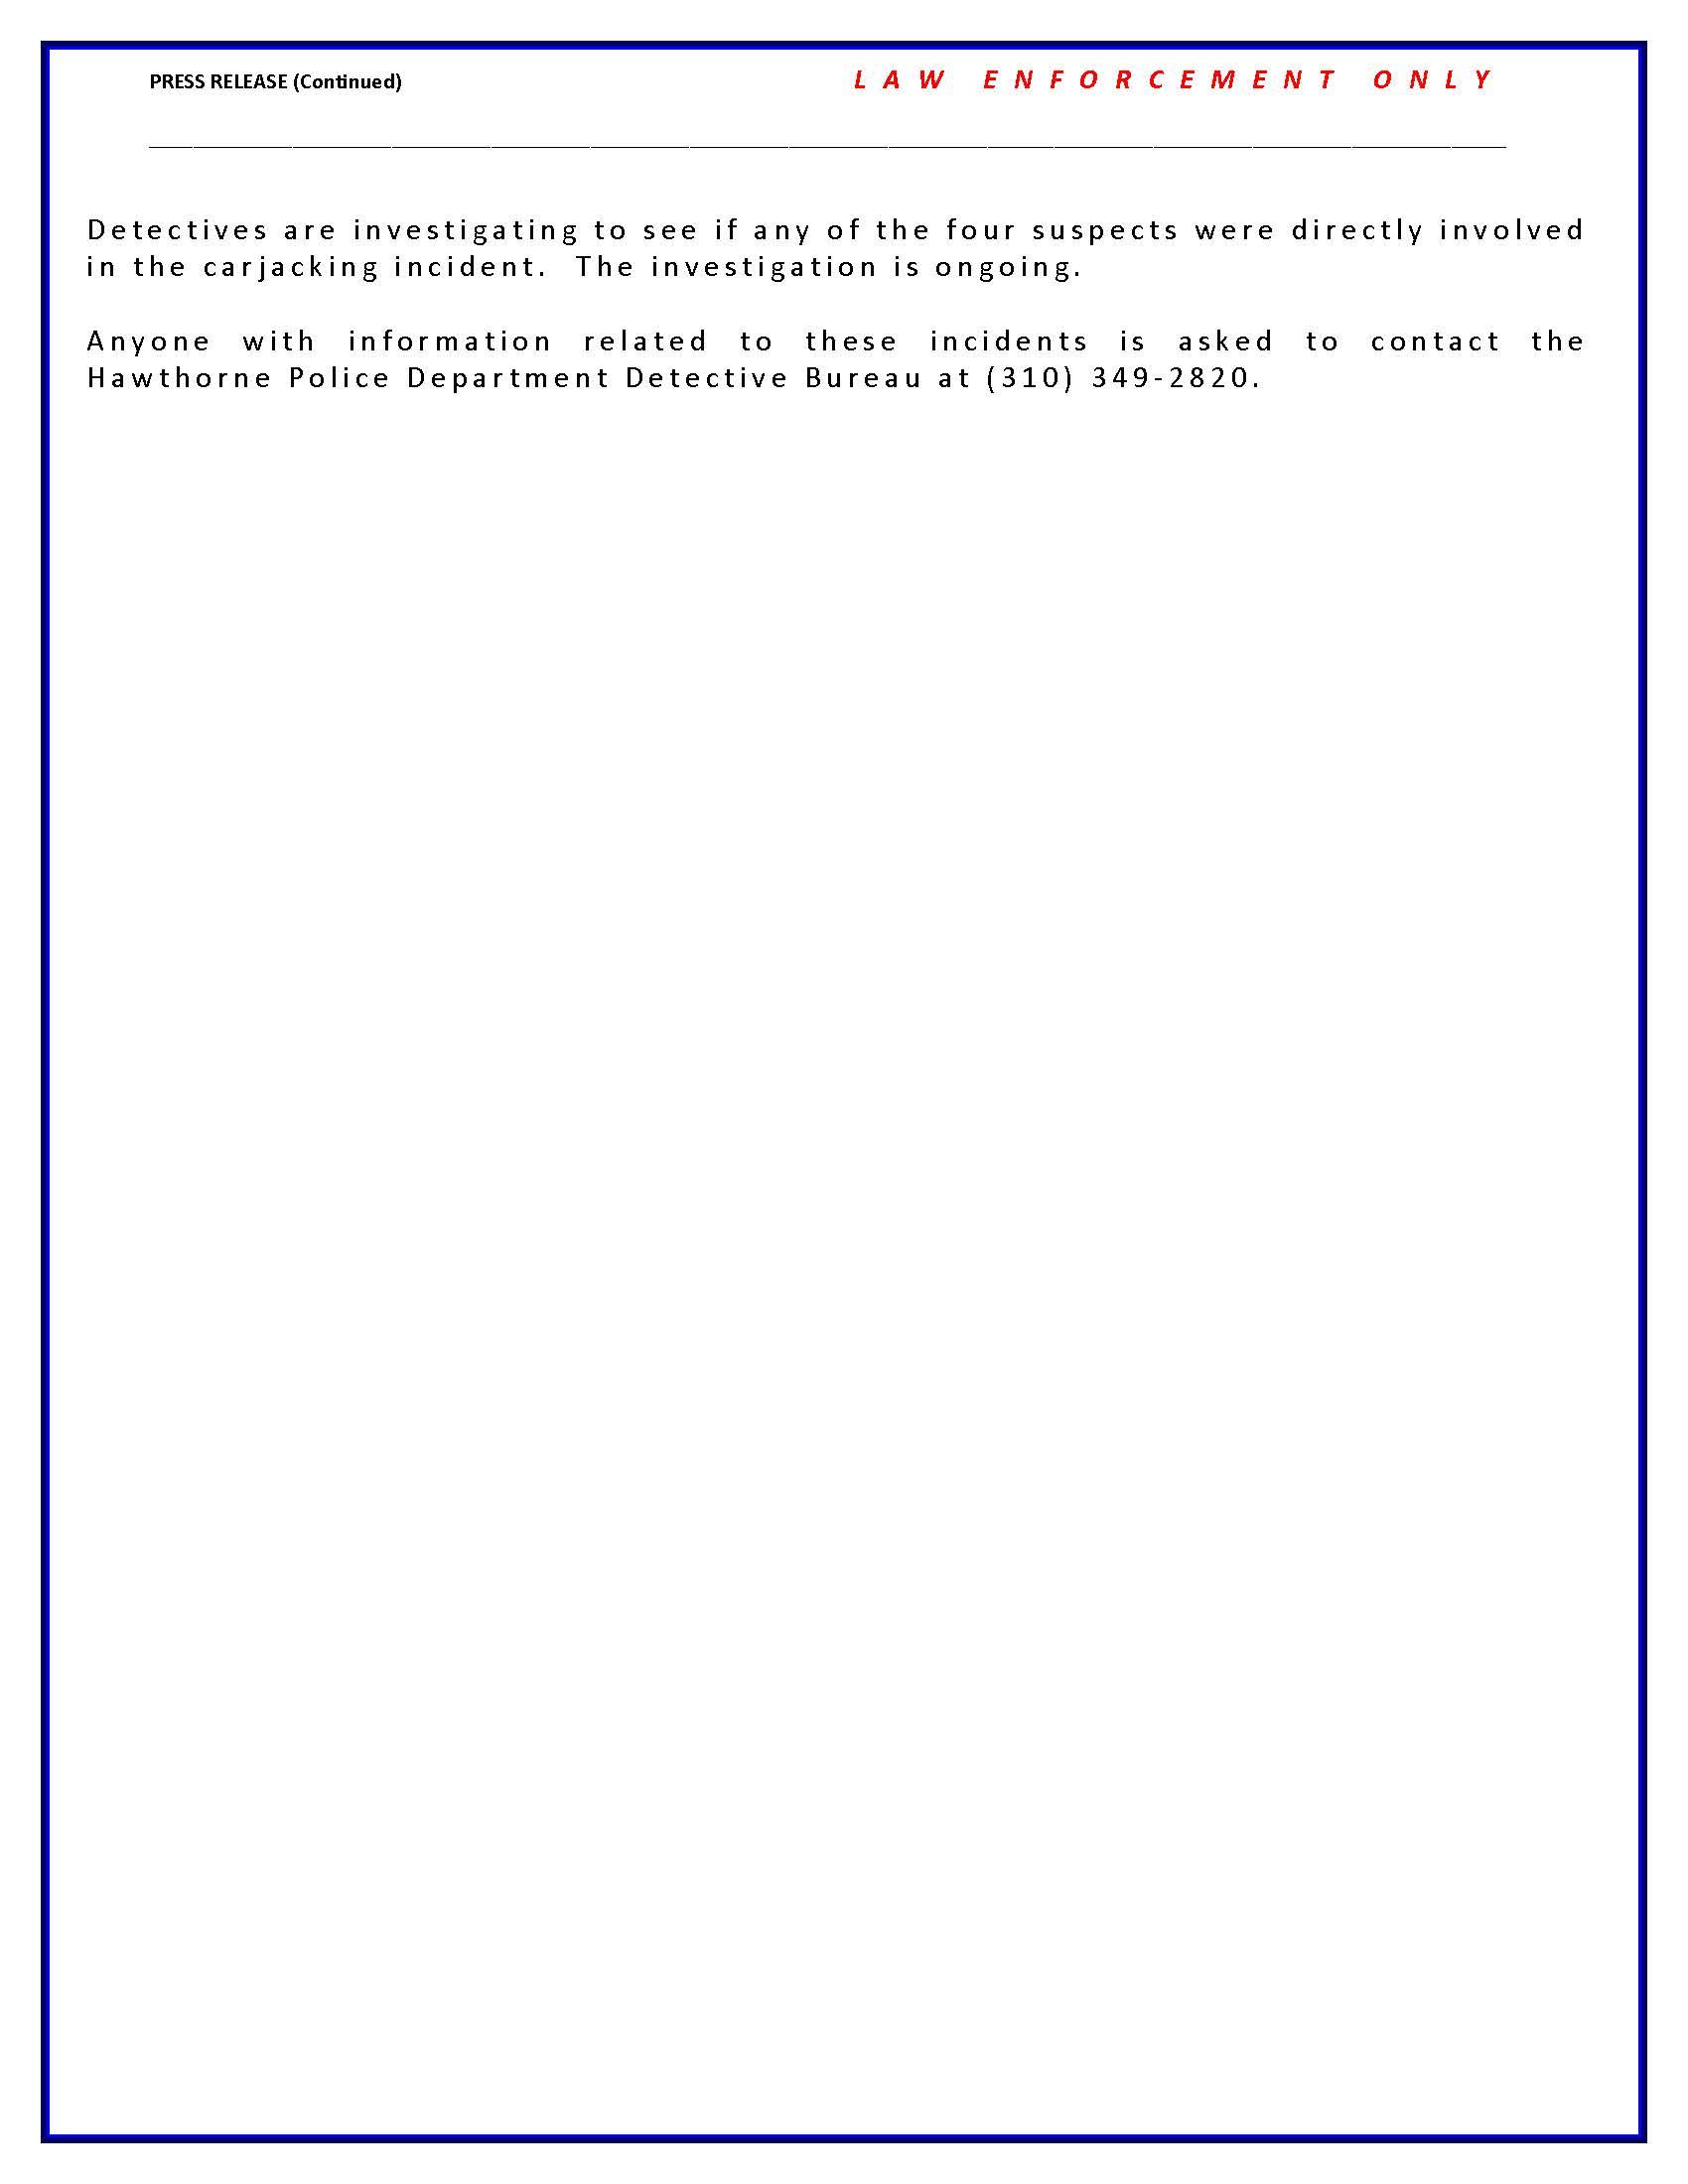 Carjacking Stolen Vehicle Arrests - page 2